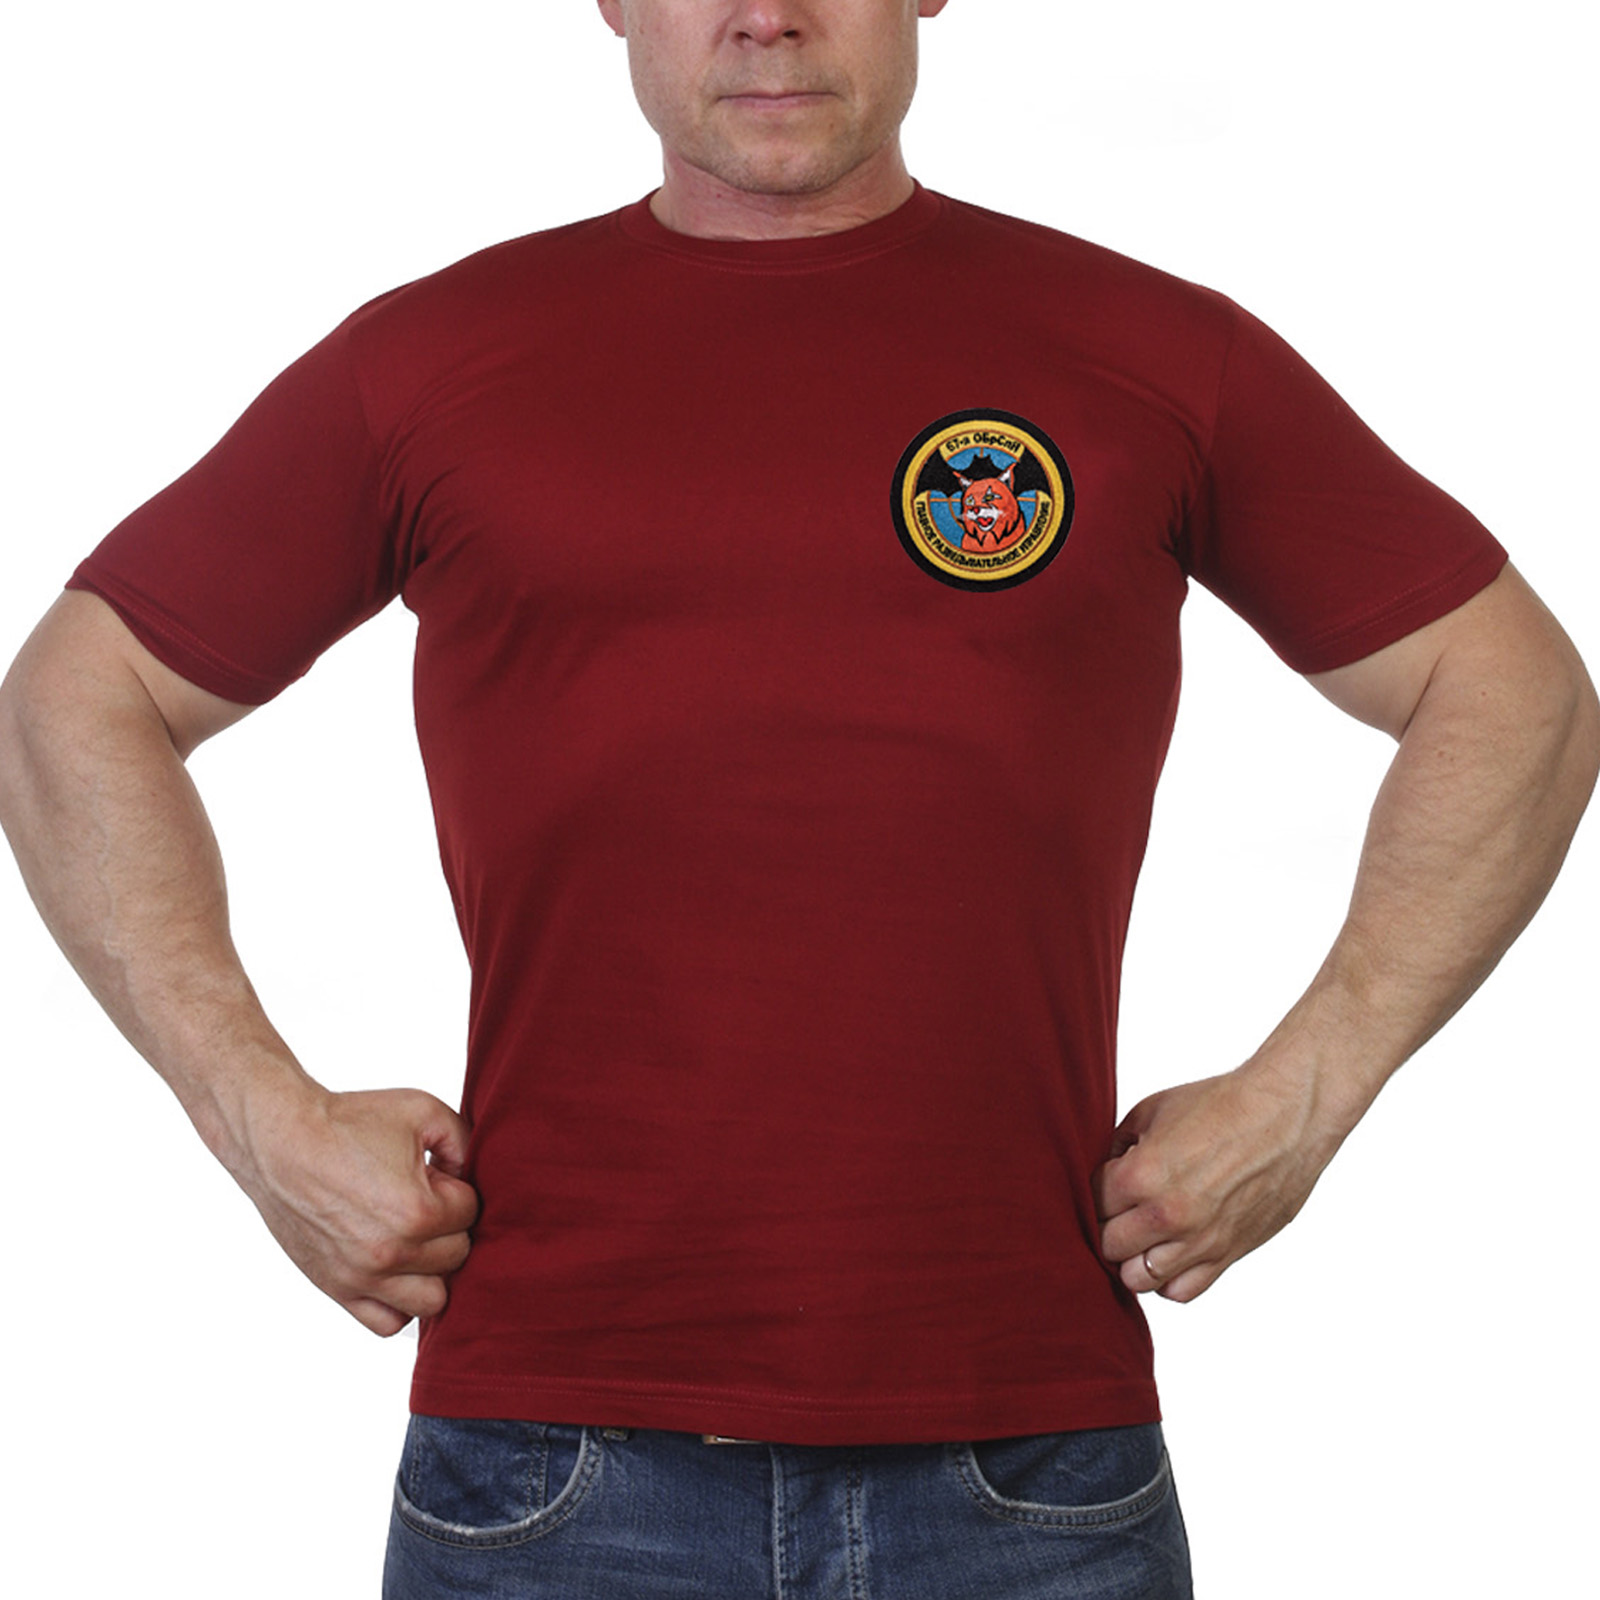 Мужская хлопковая футболка 67 ОБрСпН